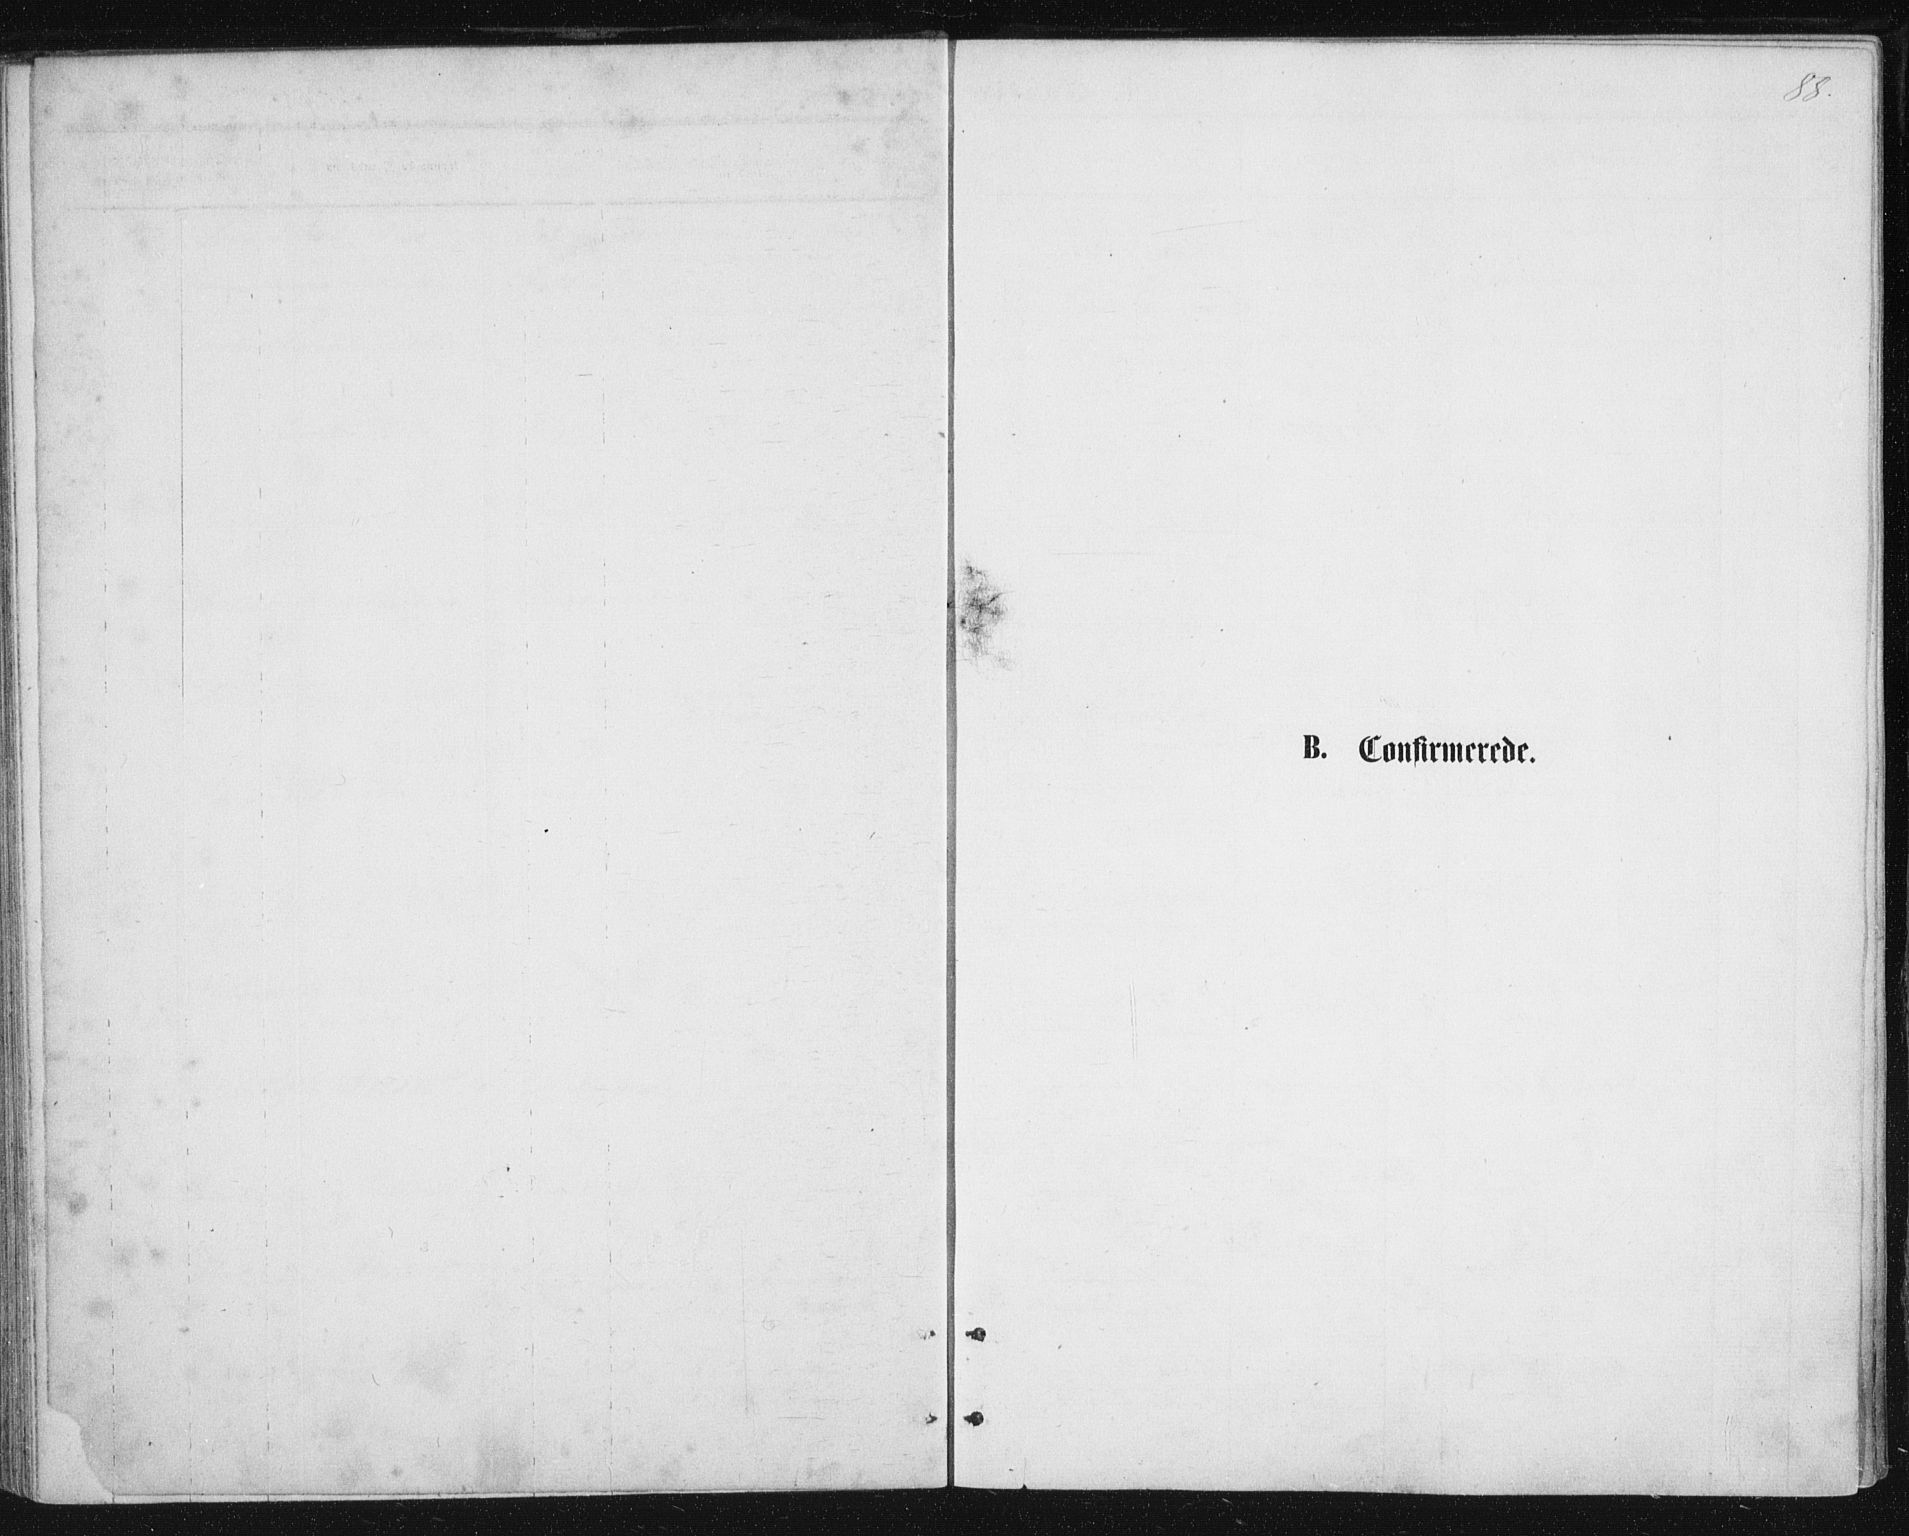 SAT, Ministerialprotokoller, klokkerbøker og fødselsregistre - Nordland, 888/L1243: Ministerialbok nr. 888A09, 1876-1879, s. 88